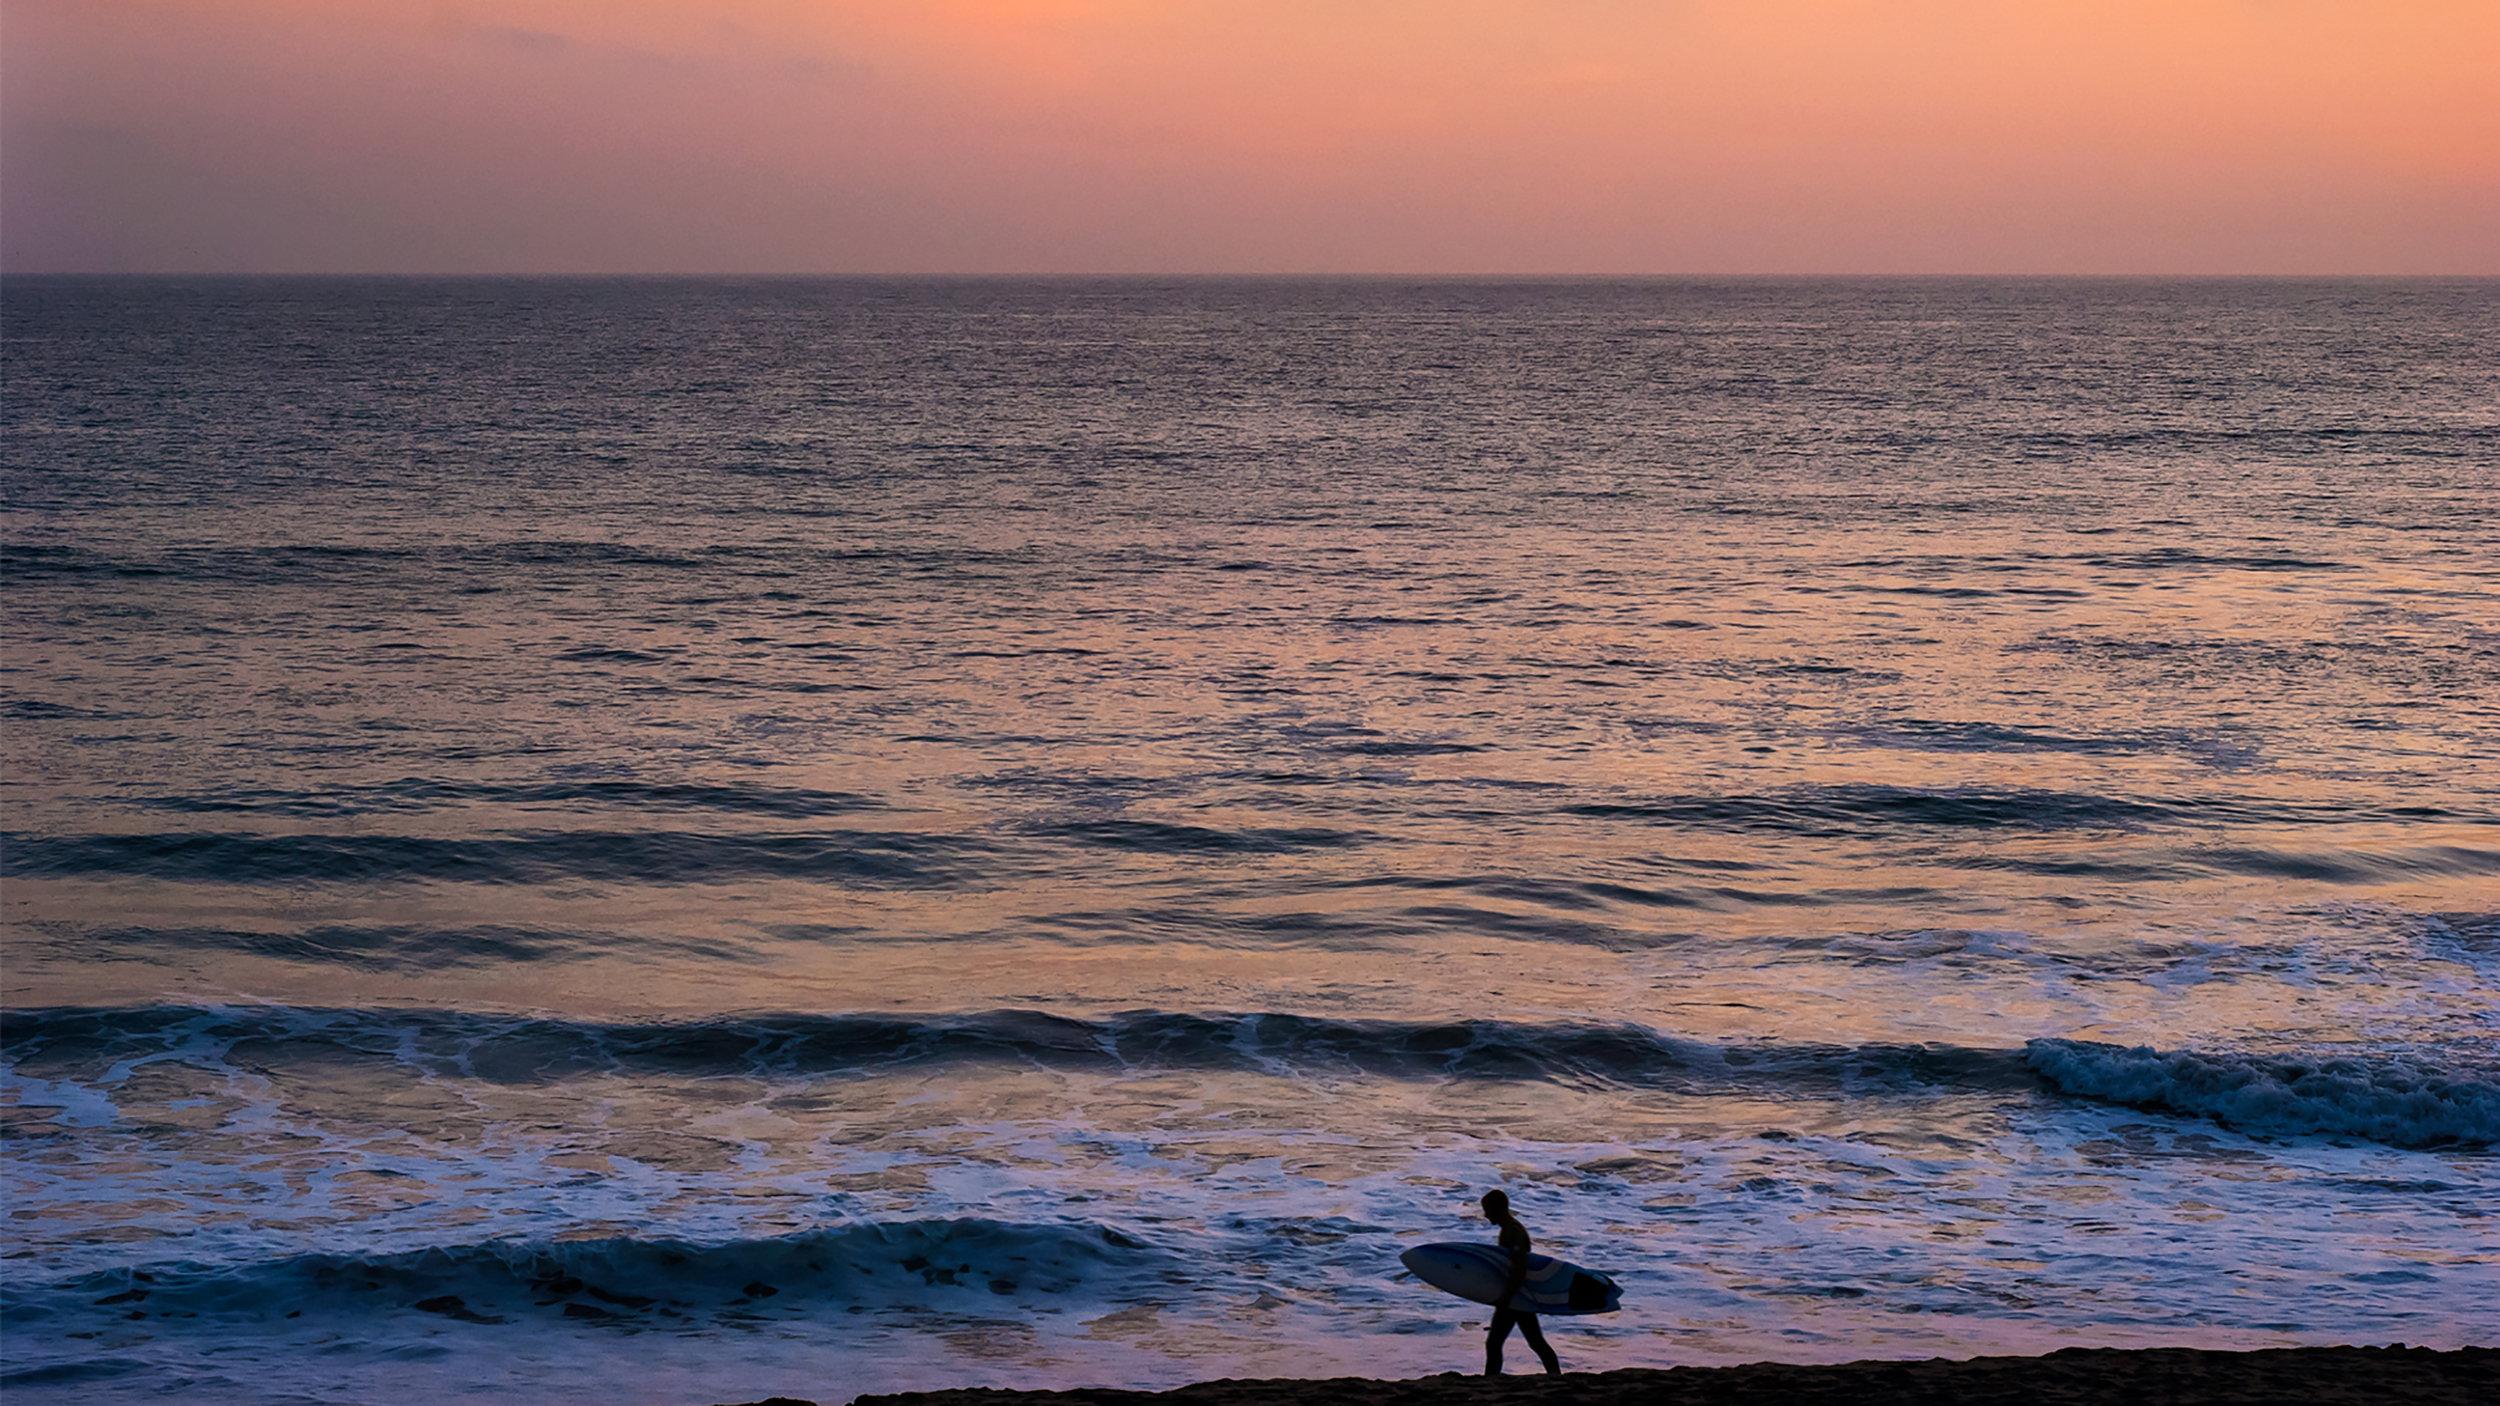 beachnightshotSURFER.jpg